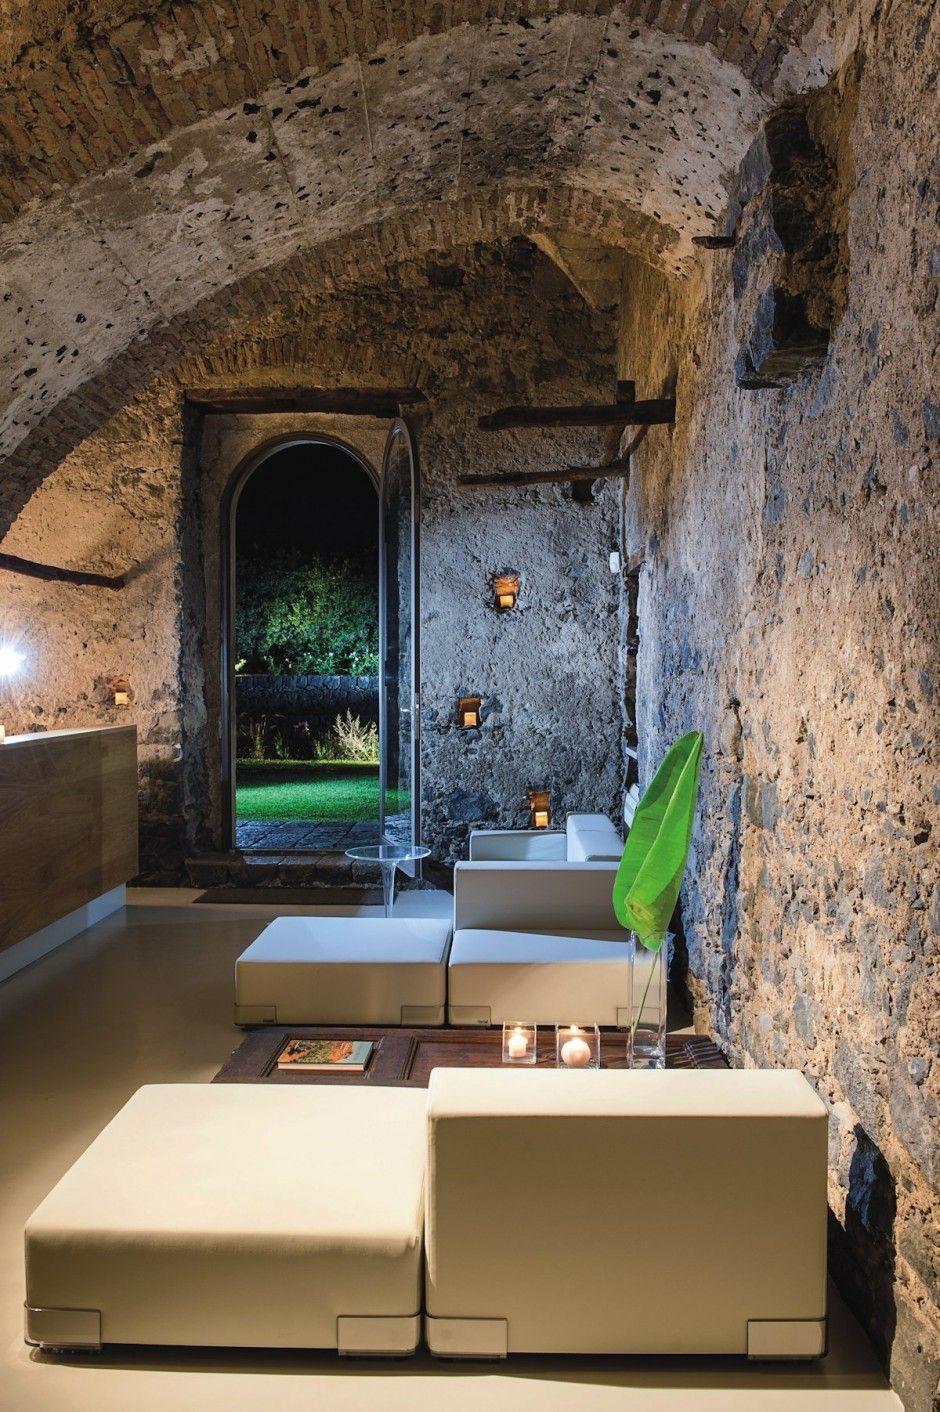 ZASH by Architect Antonio Iraci, a boutique hotel located in Sicily, Italy. http://goo.gl/B4ANSa